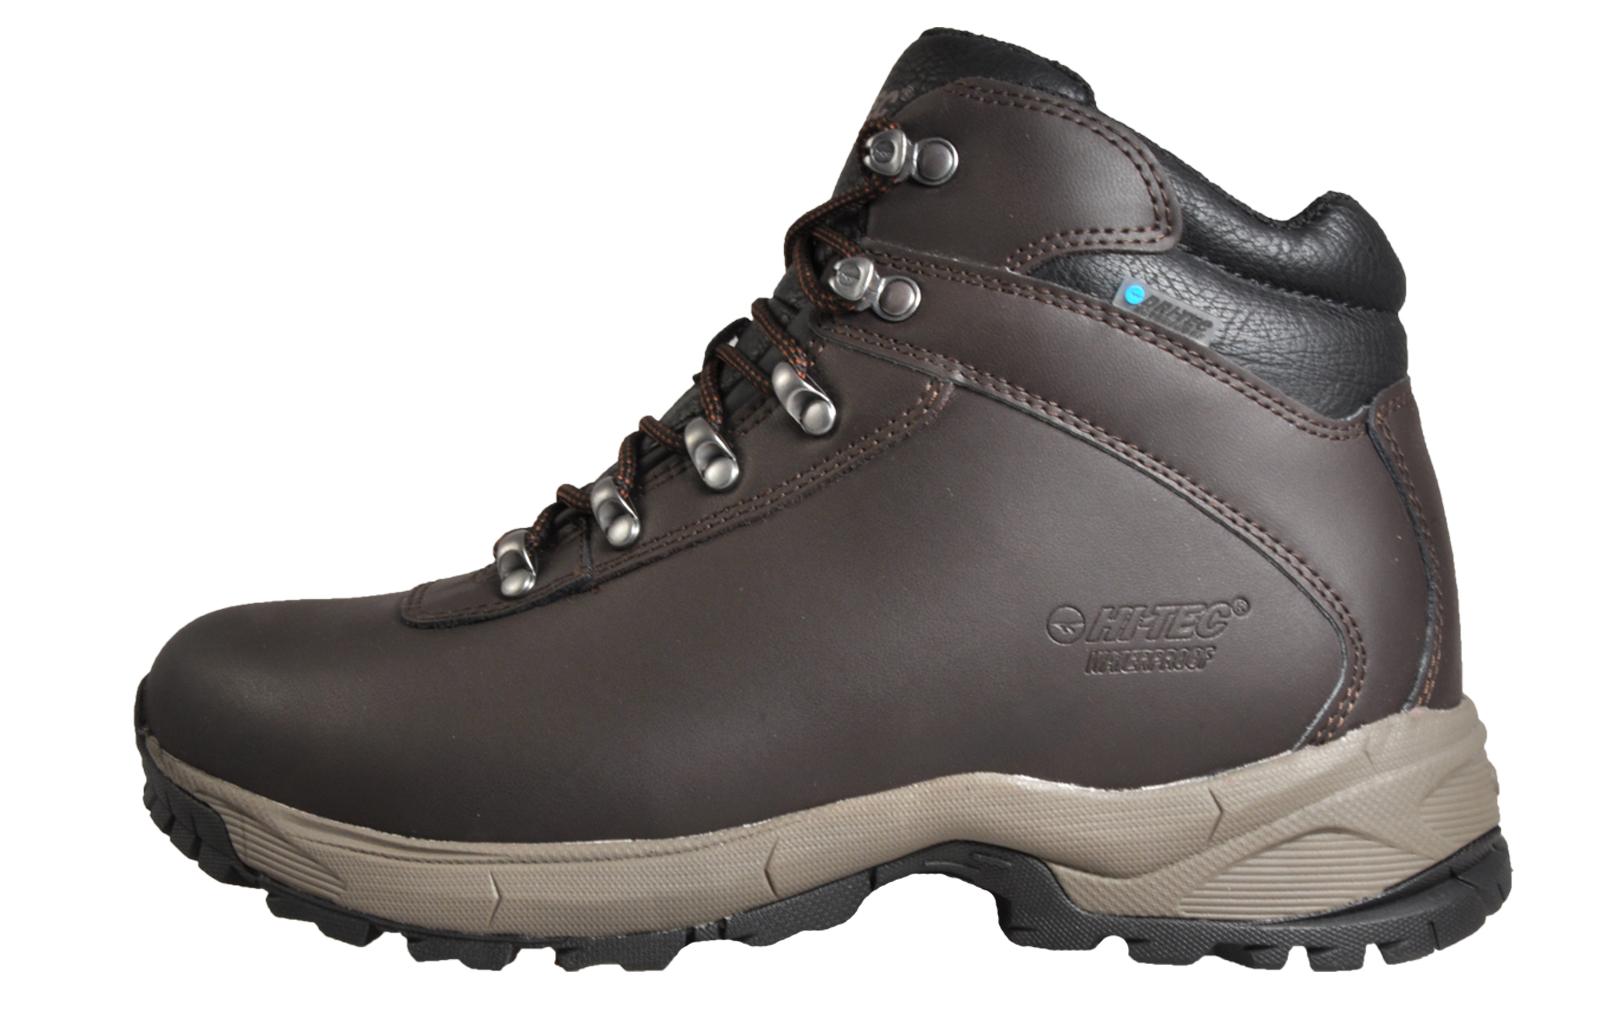 e5da87ae0b5 Details about Hi Tec Eurotrek Lite WP Men's Waterproof Walking Hiking Boots  Brown